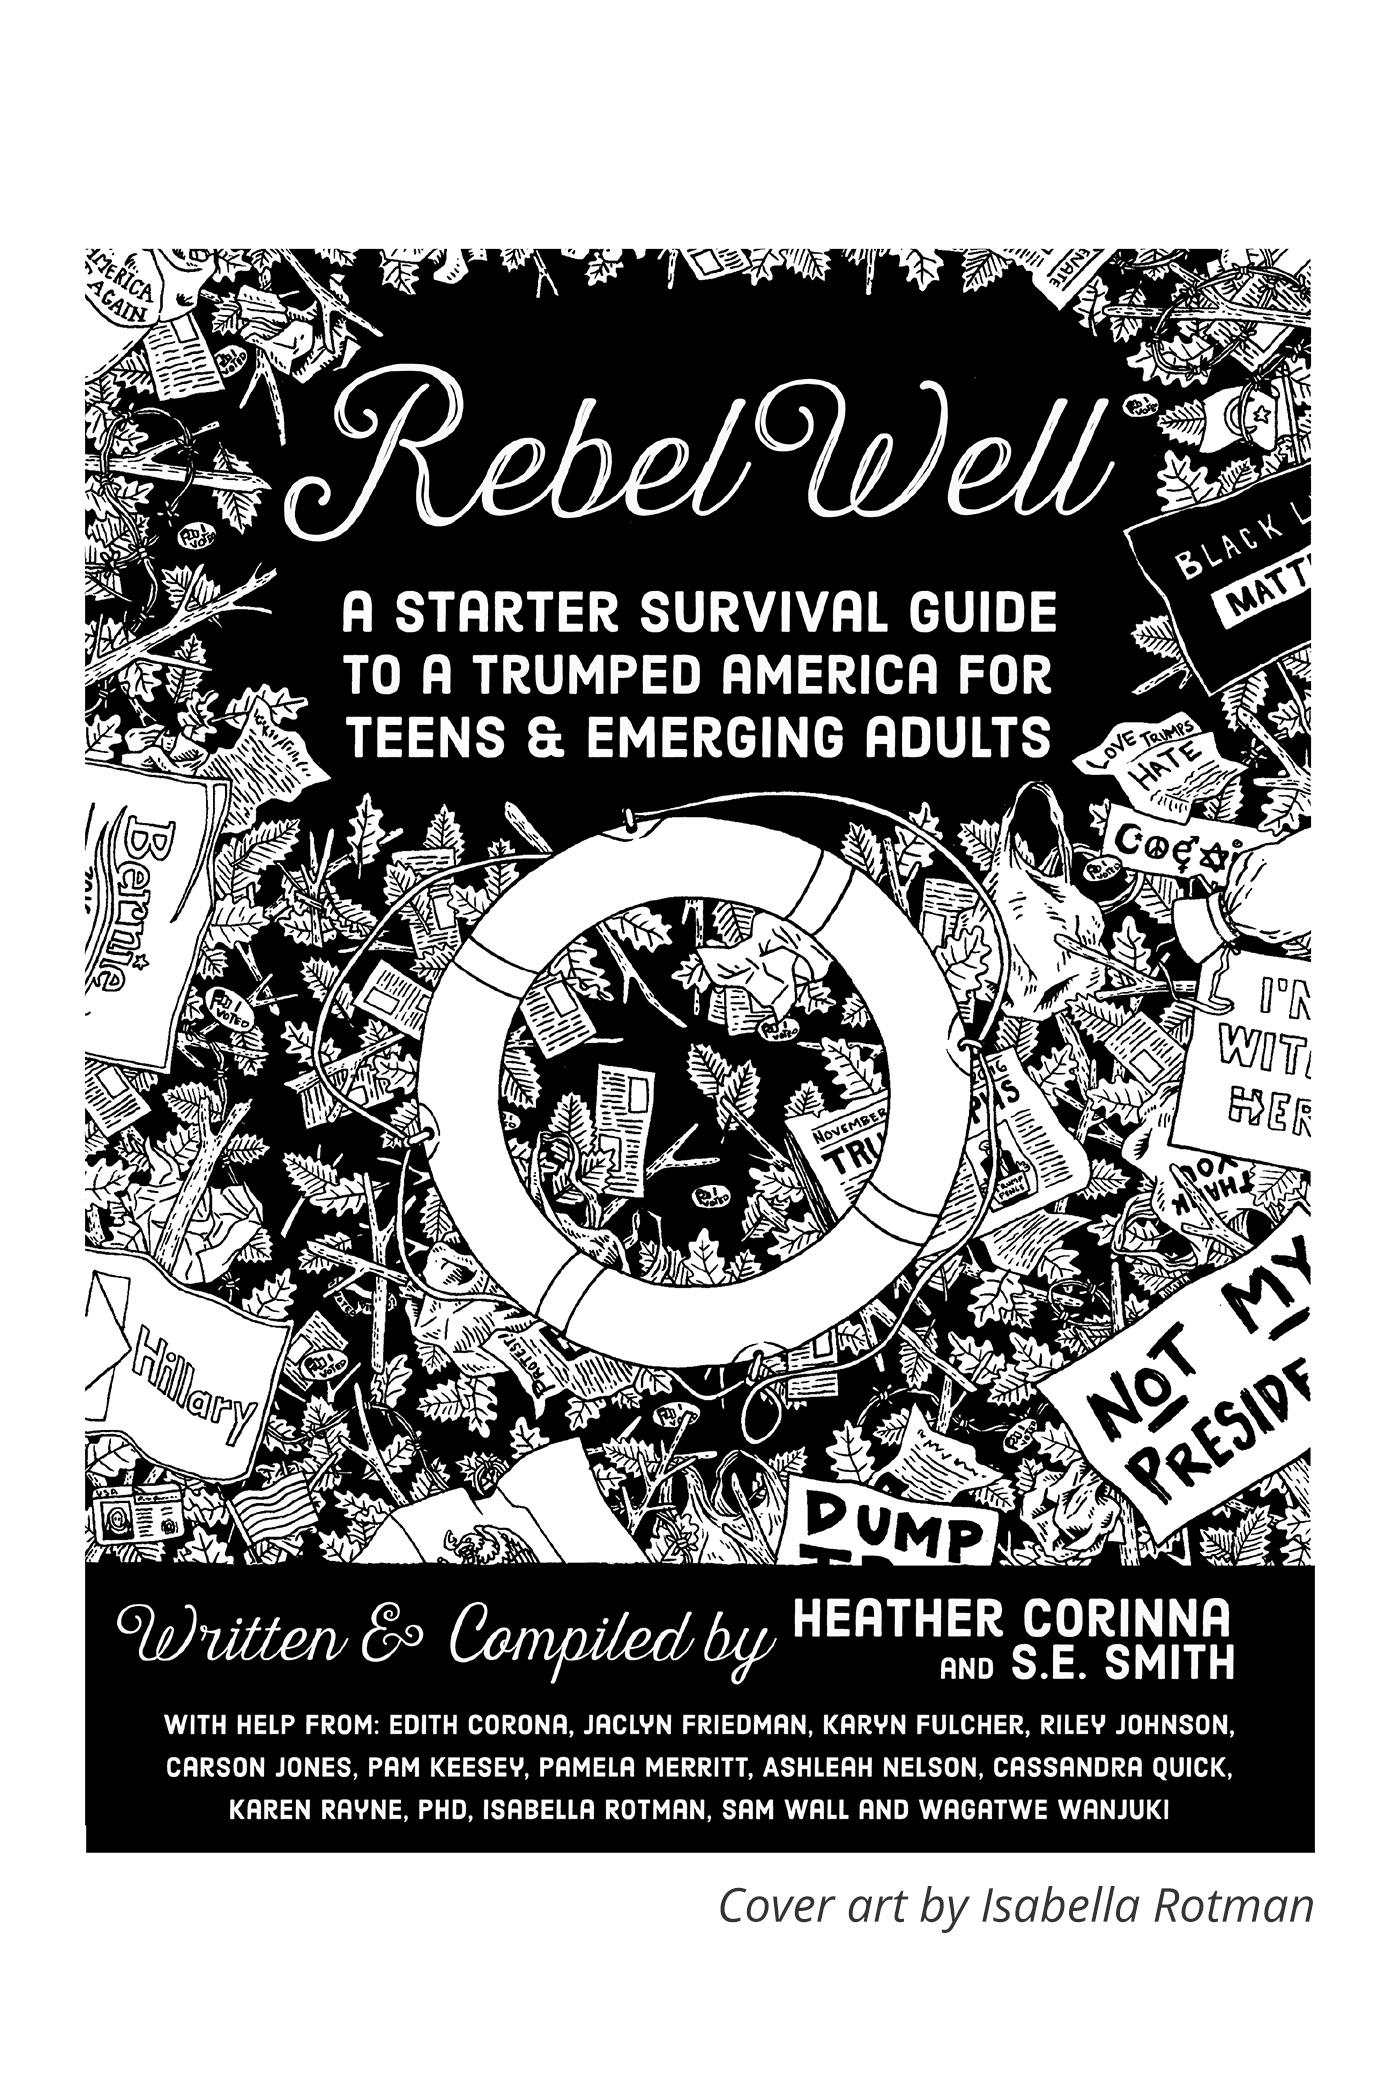 Rebell Well